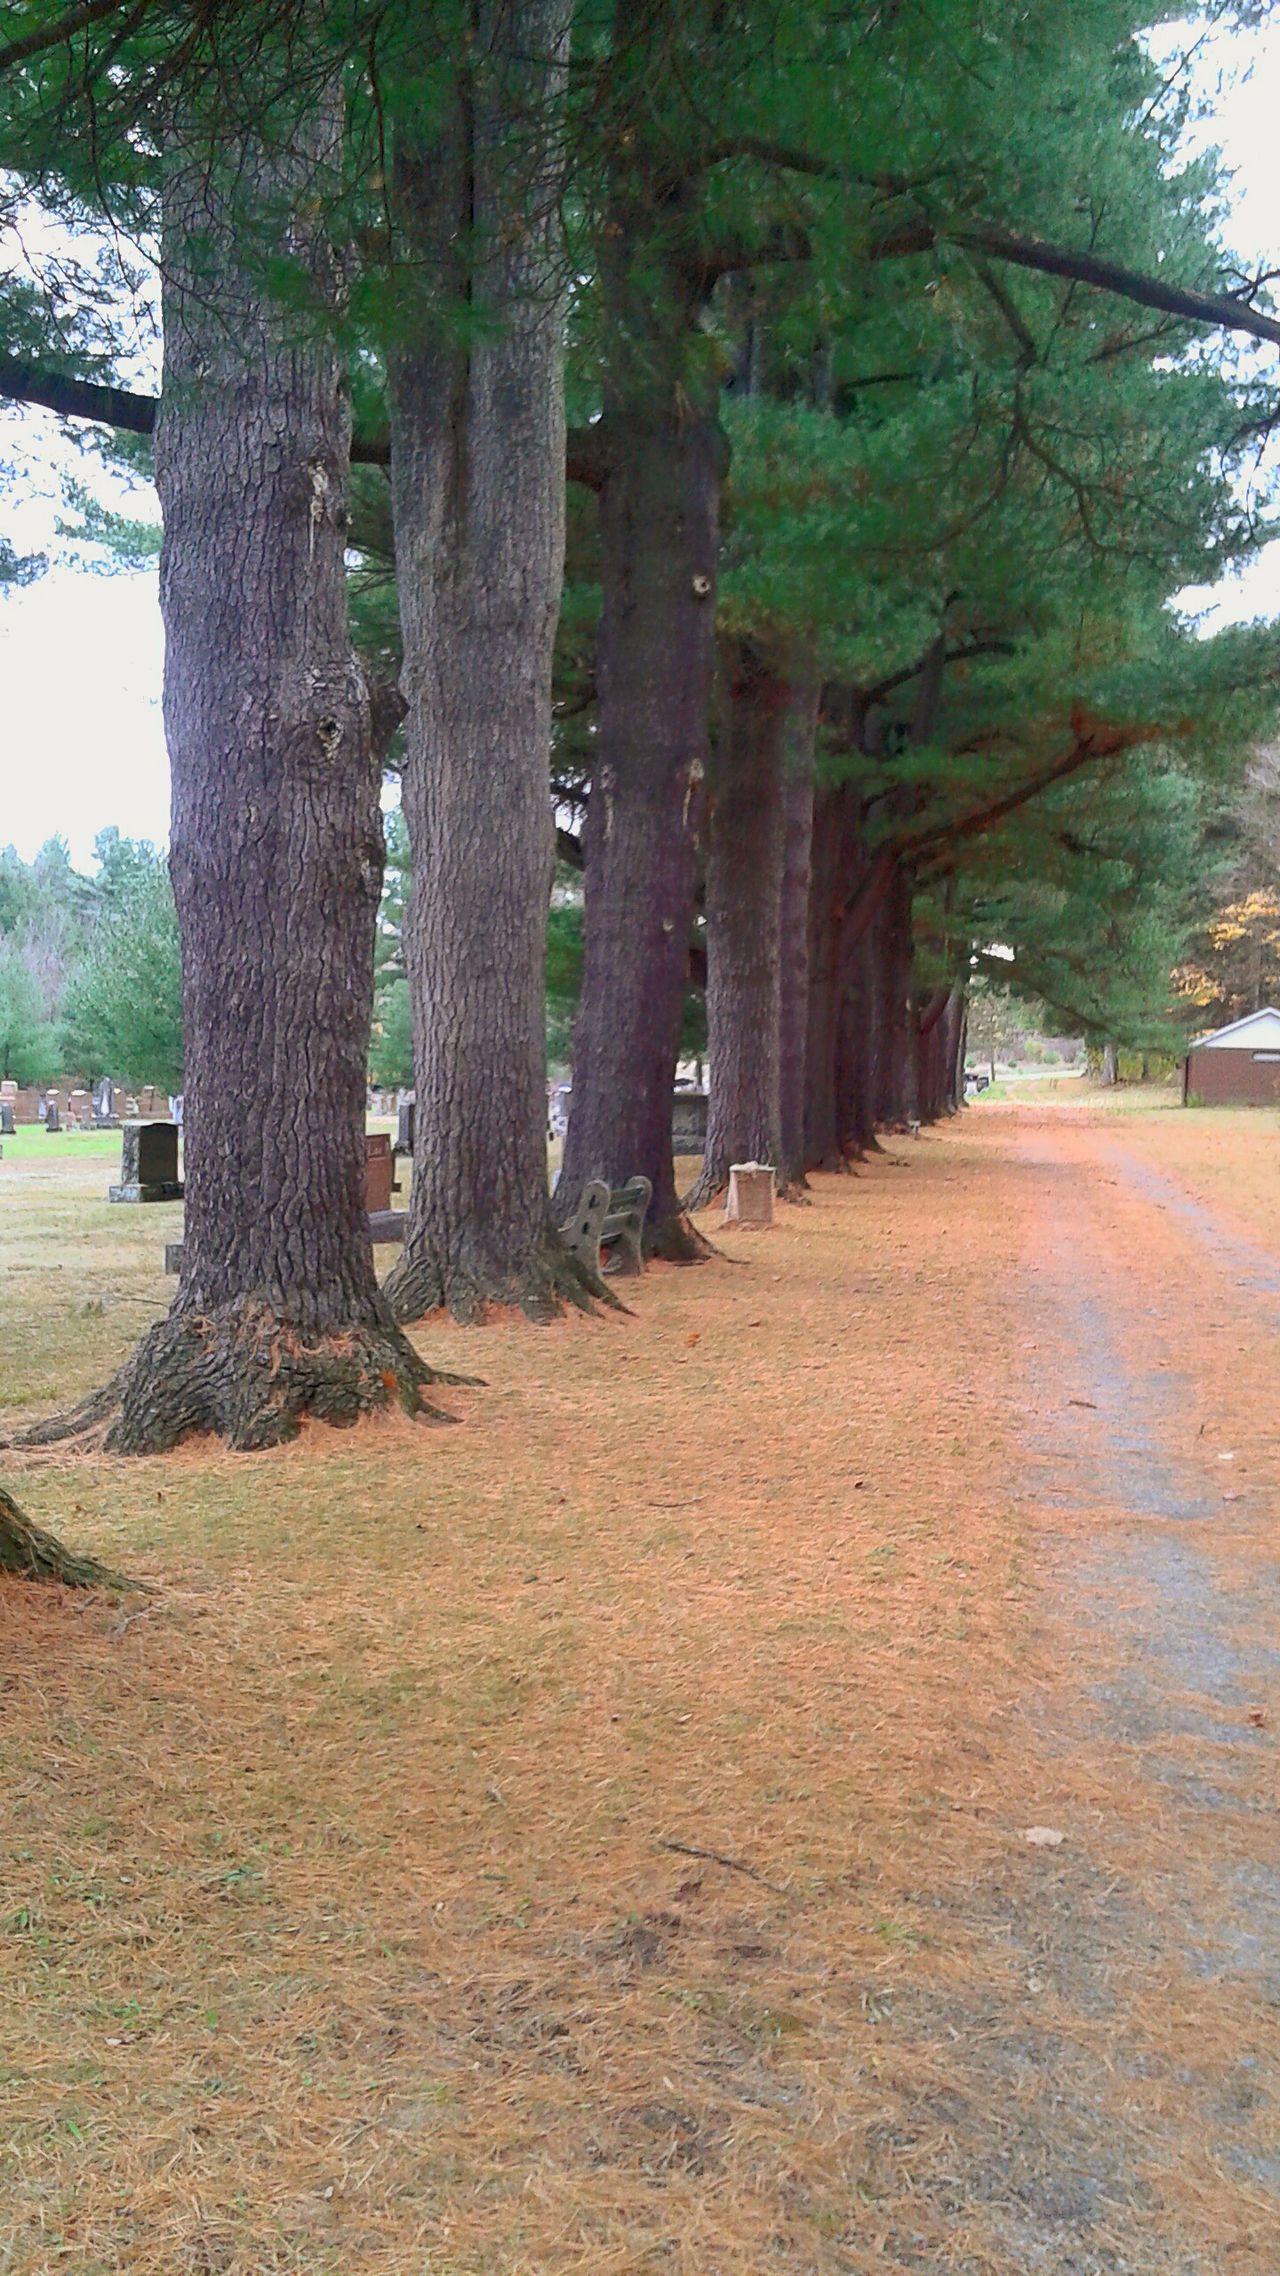 Cimetary Cimetiere Tree Pine Tree Pin Whitepine Pinblanc Pinwood Granby